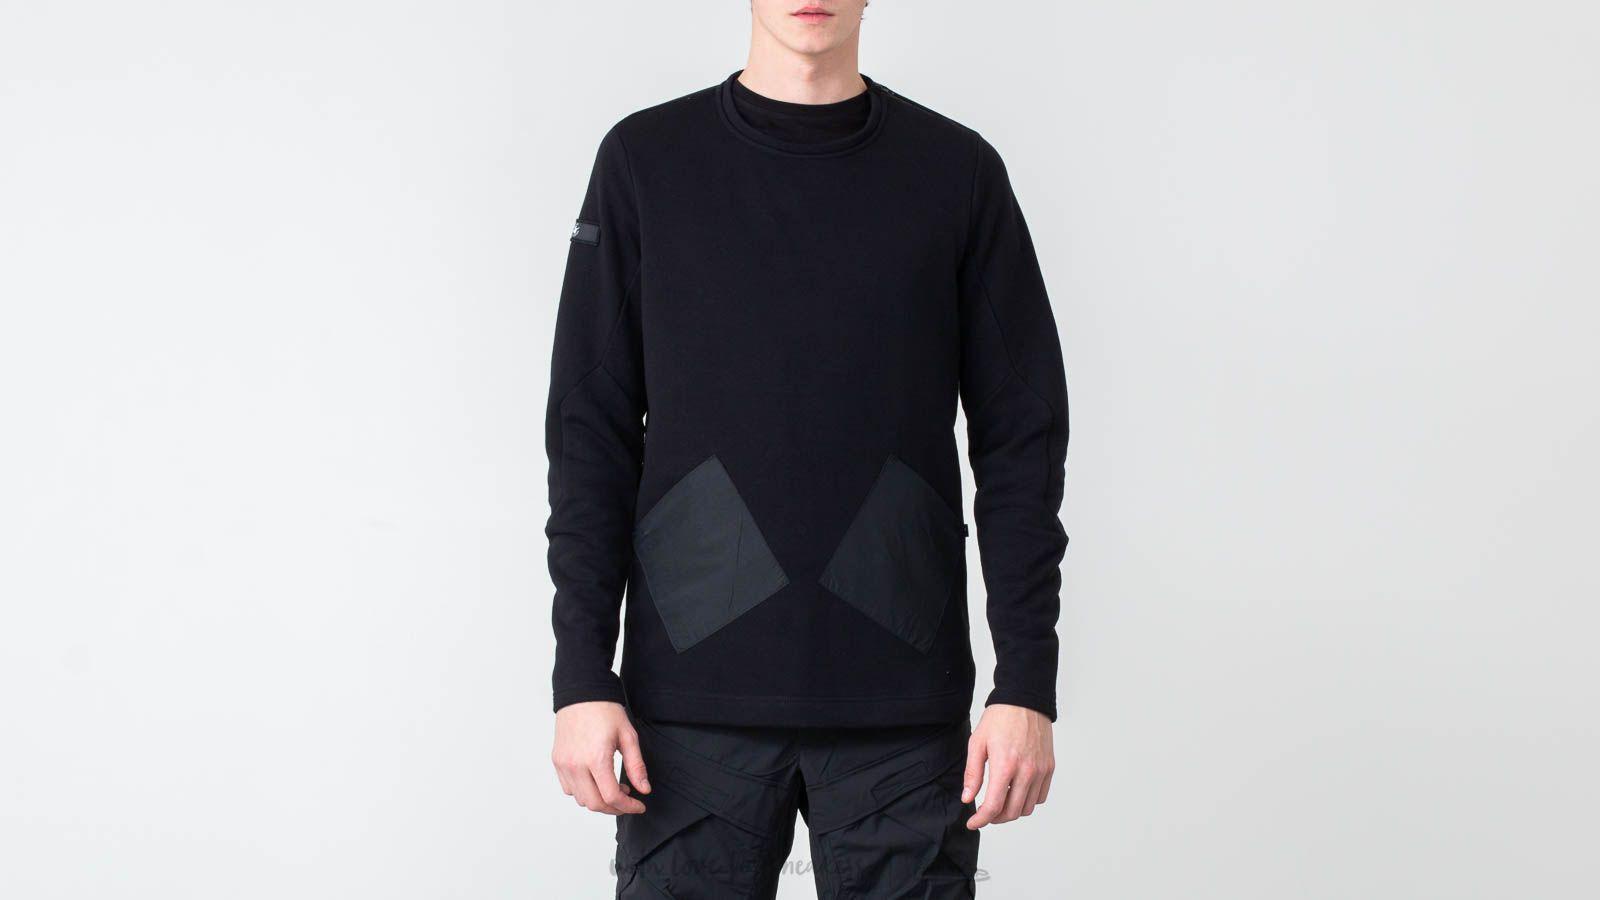 Riot Division 2 Pockets Sweatshirt Black za skvelú cenu 95 € kúpite na Footshop.sk